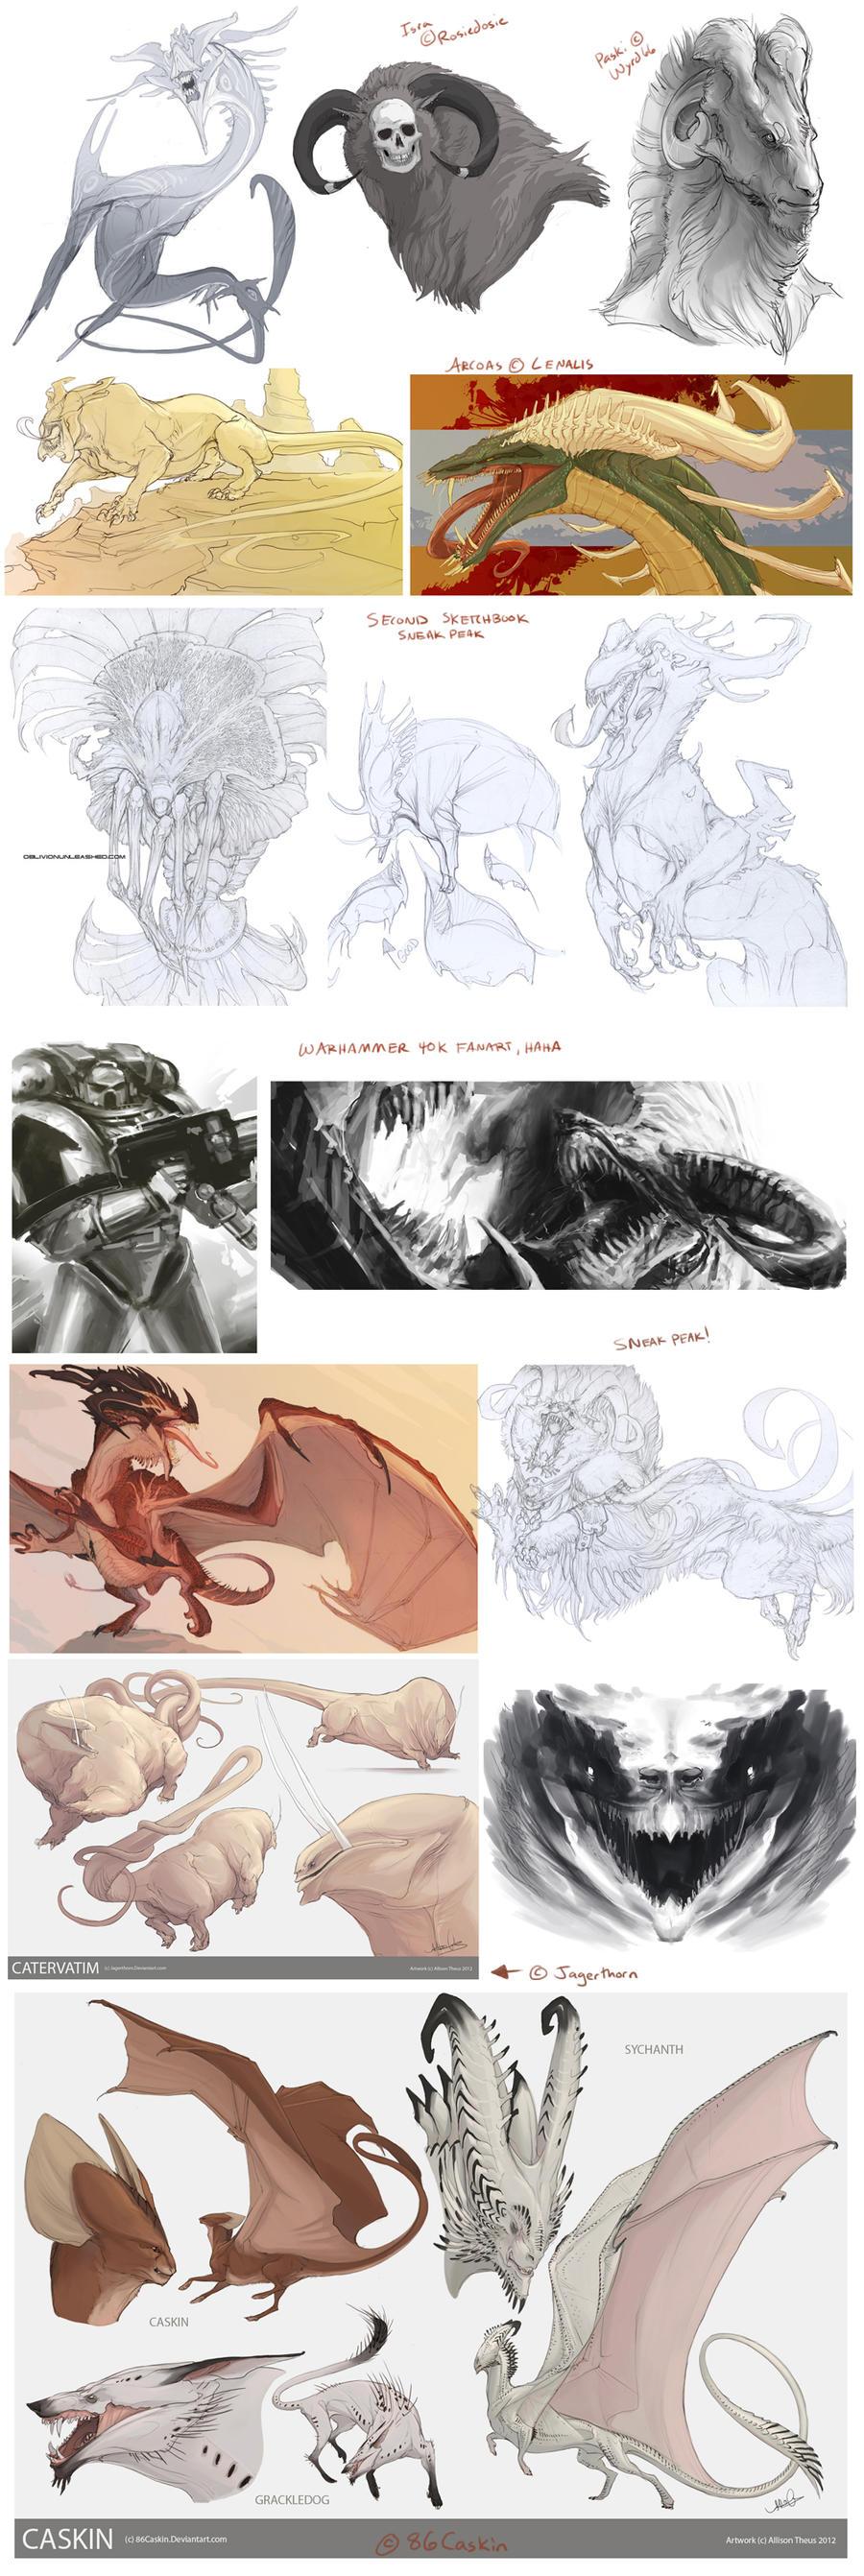 Creature Sketchdump 2 by beastofoblivion